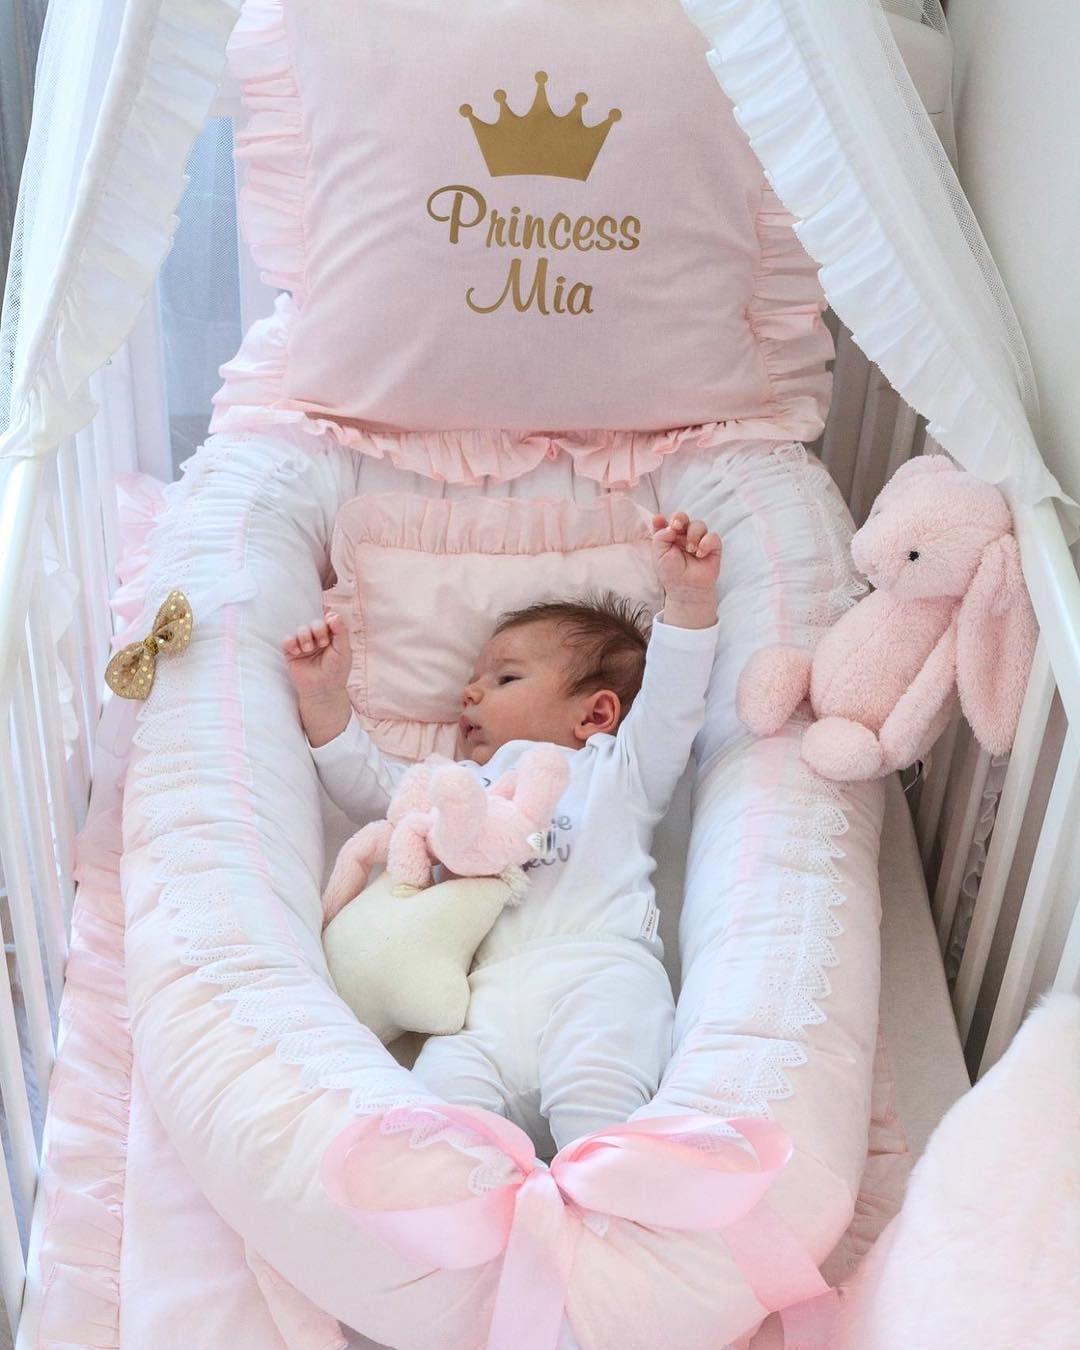 72 Likes 2 Comments Luxury Baby Fashion Luxury Baby Fashion On Instagram Morning Princess Baby Nursery Inspiration Baby Girl Nursery Room Luxury Baby Luxury newborn baby room